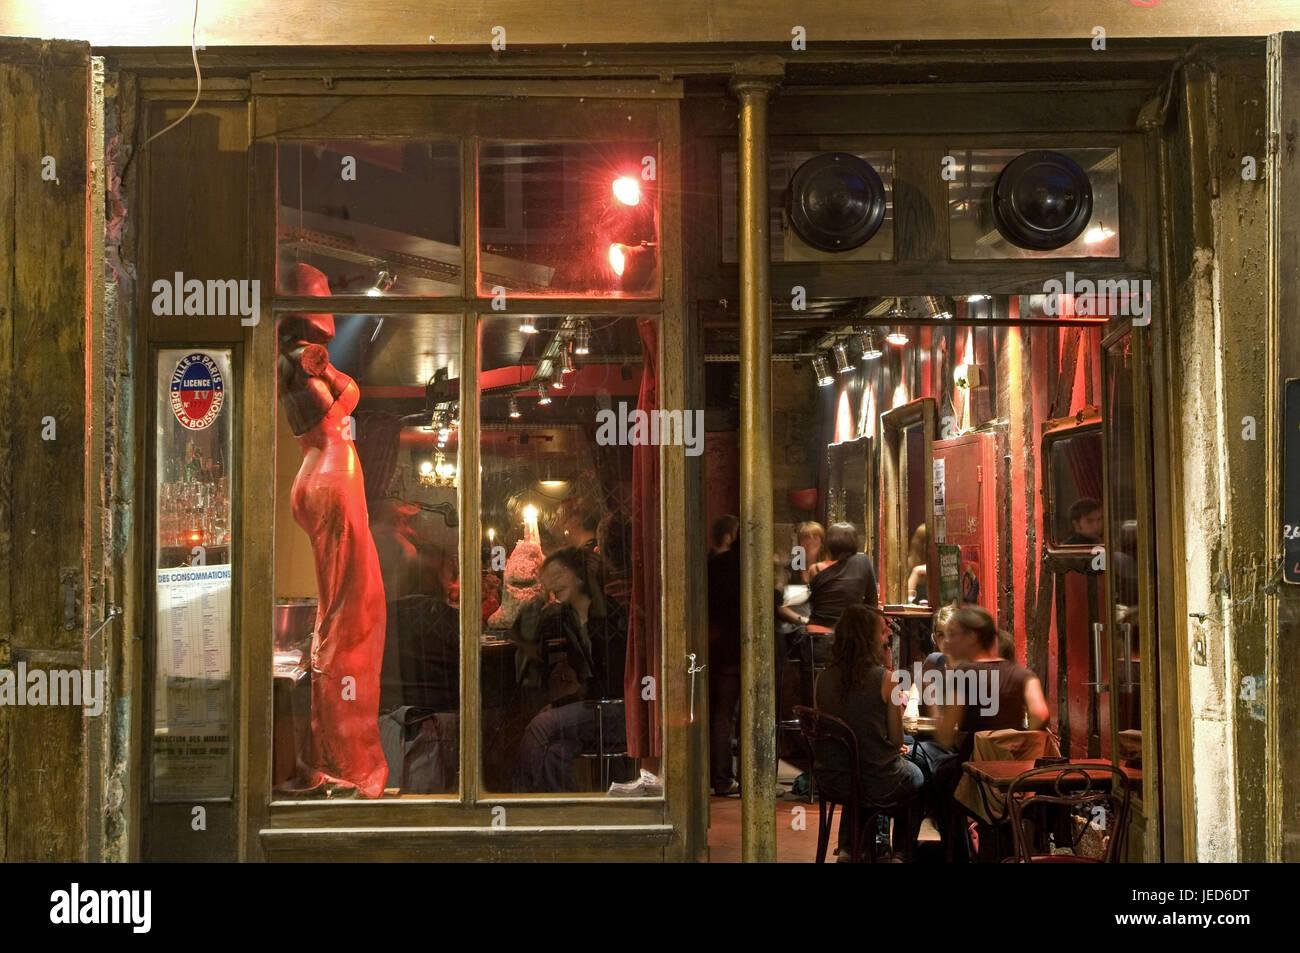 France, Paris, Rue de Laplander, bar, guests, no model release, - Stock Image